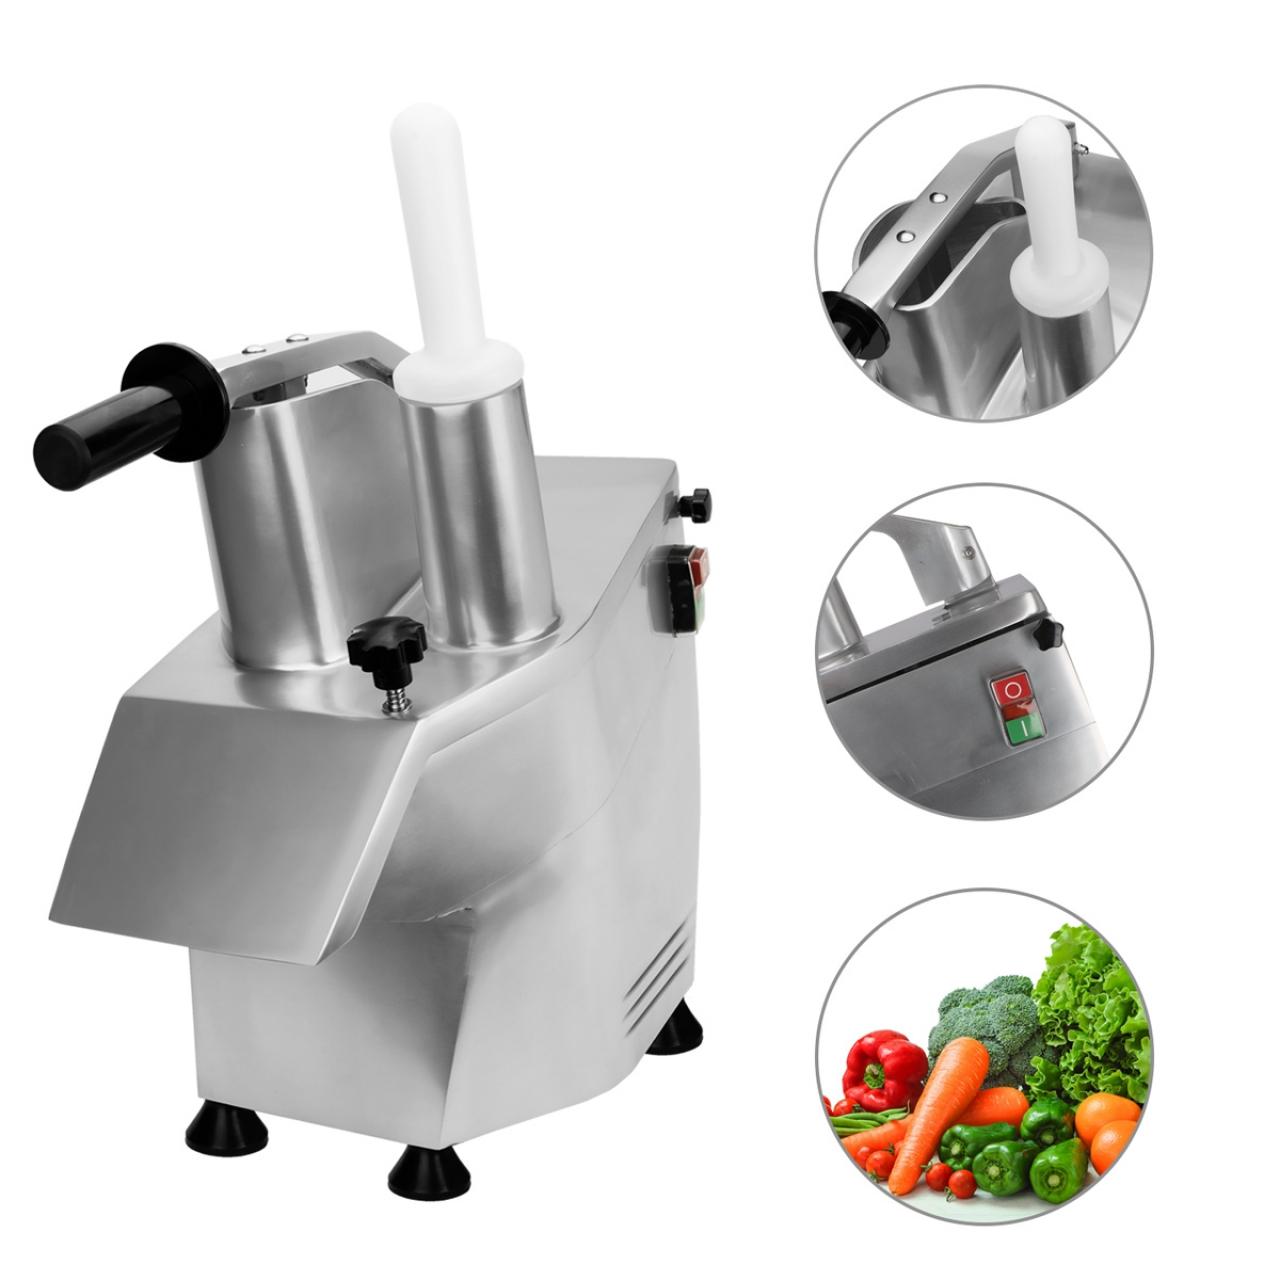 Vegetable slicer 550W